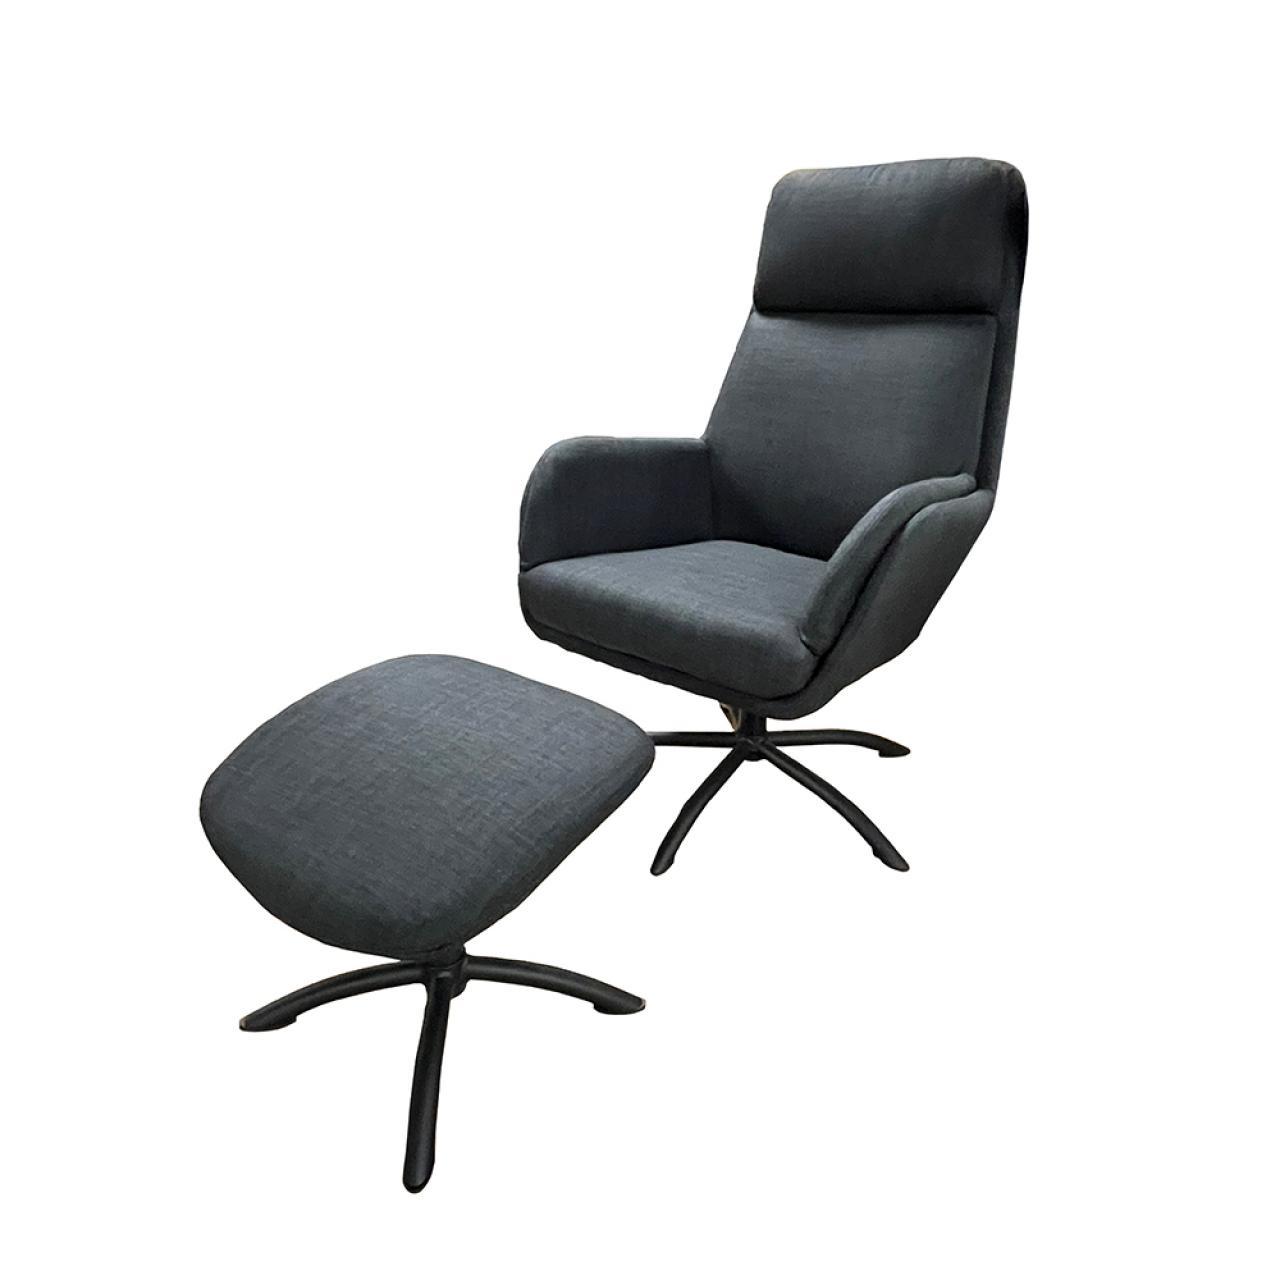 Relaxsessel FM-438 in Anthrazit mit Fußhocker 360° Drehbar Fernsehsessel Sessel